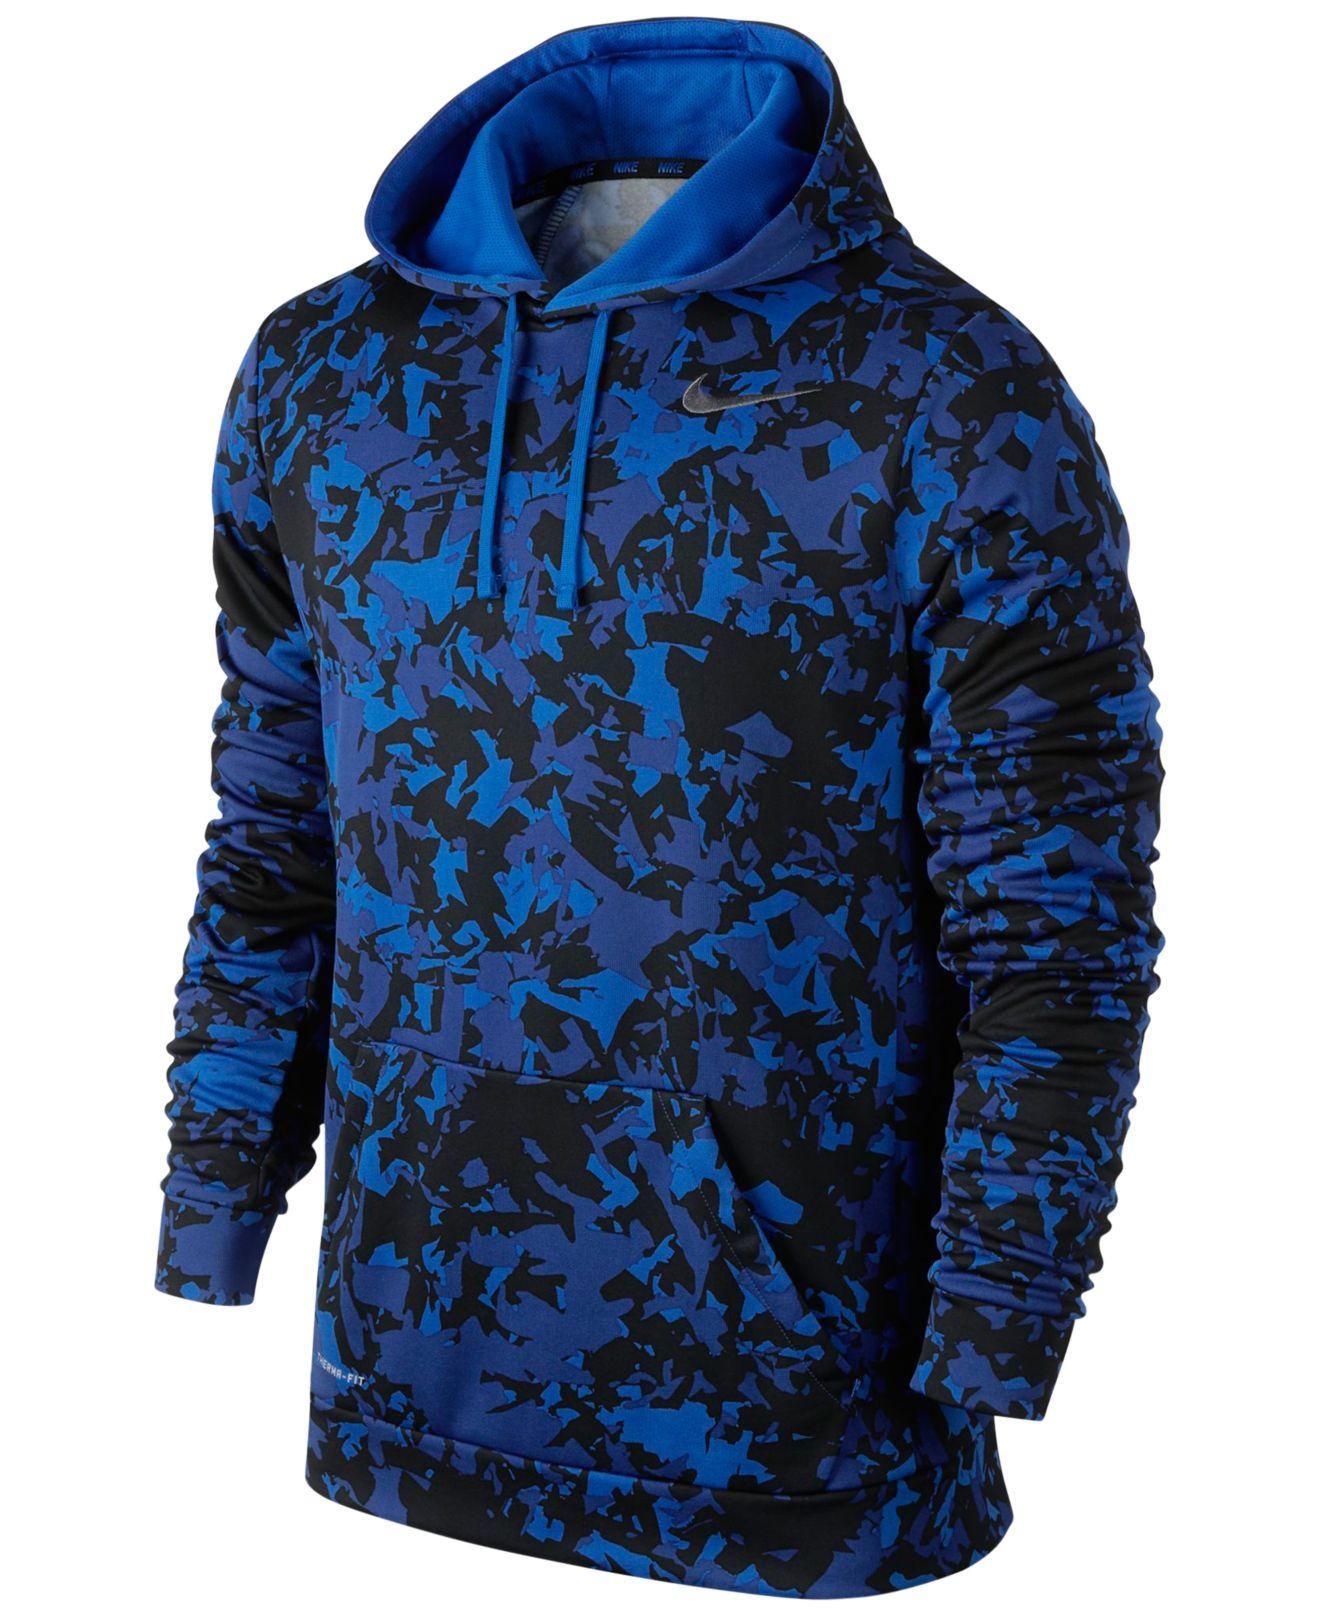 Men's Nike In Splinter Training Blue Hoodie Camo Ko Pullover Lyst qpF5q